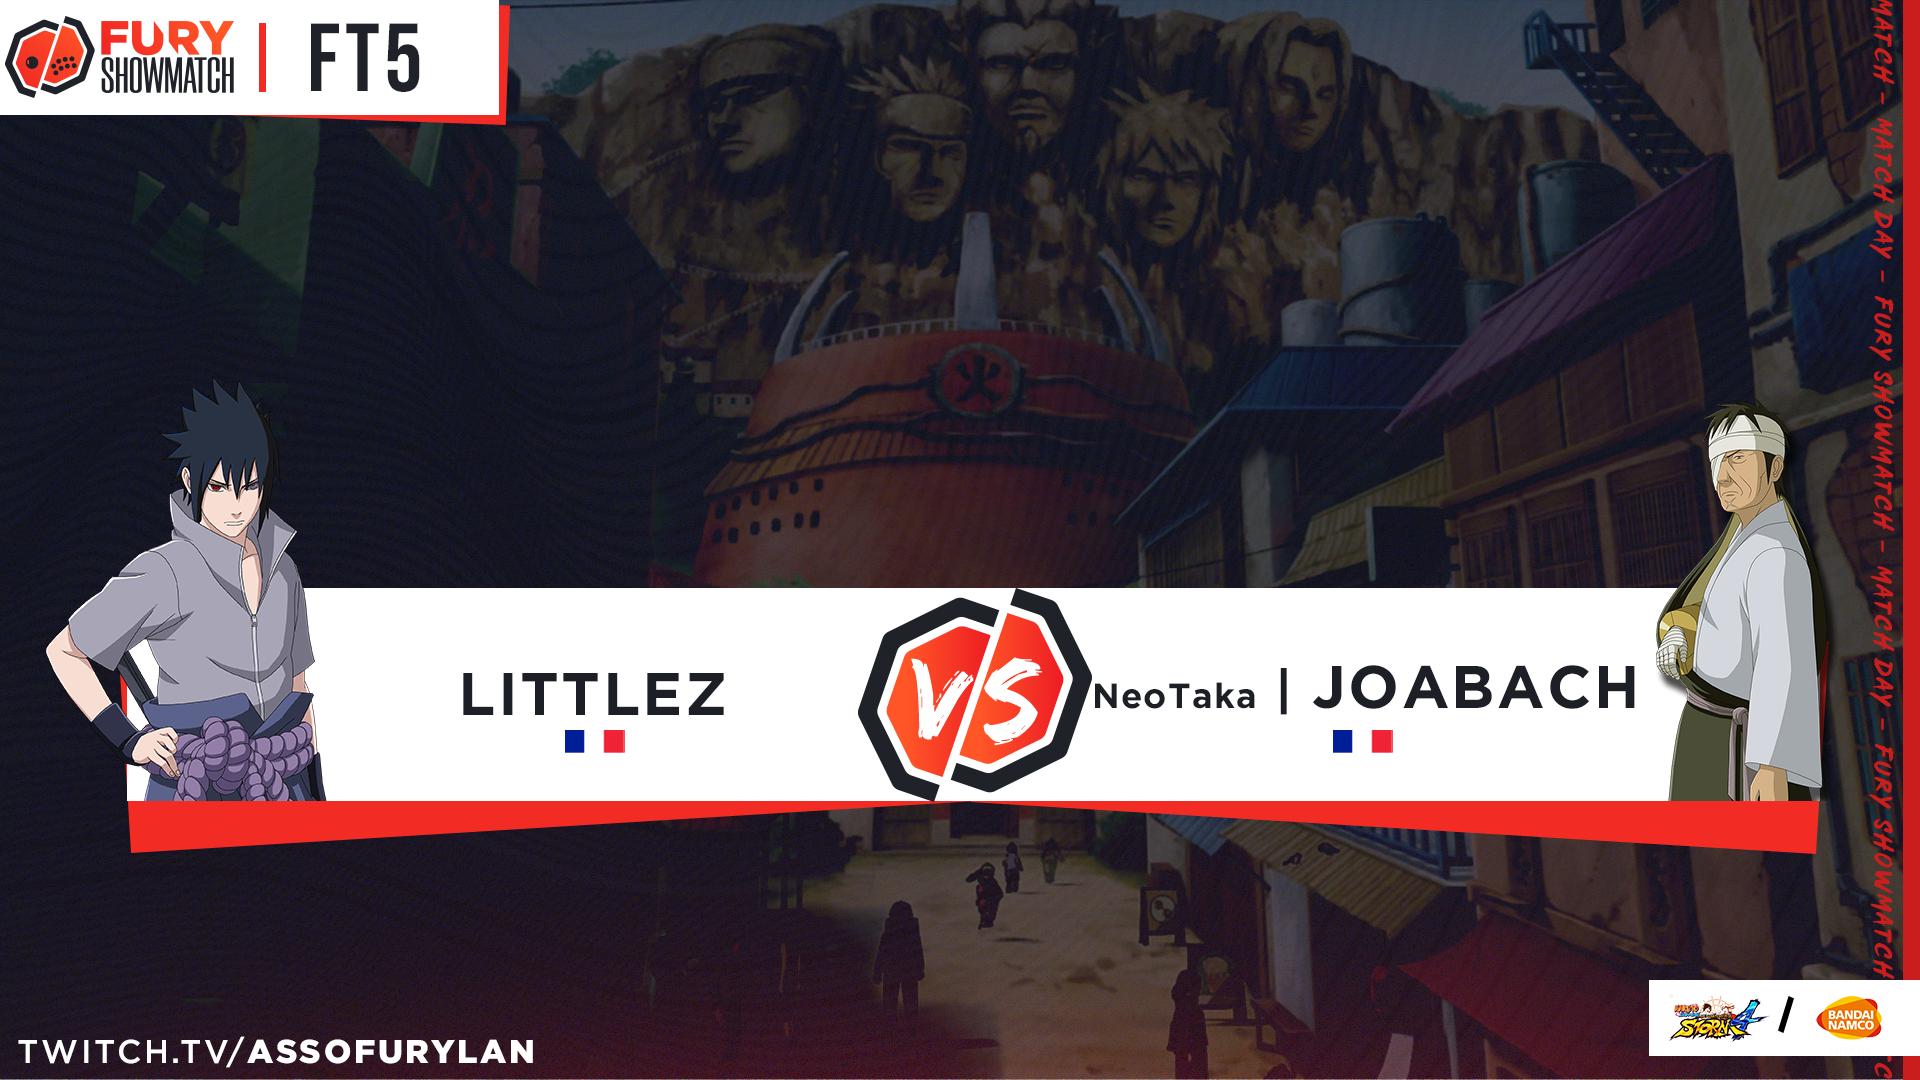 LITTLEZ vs JOABACH